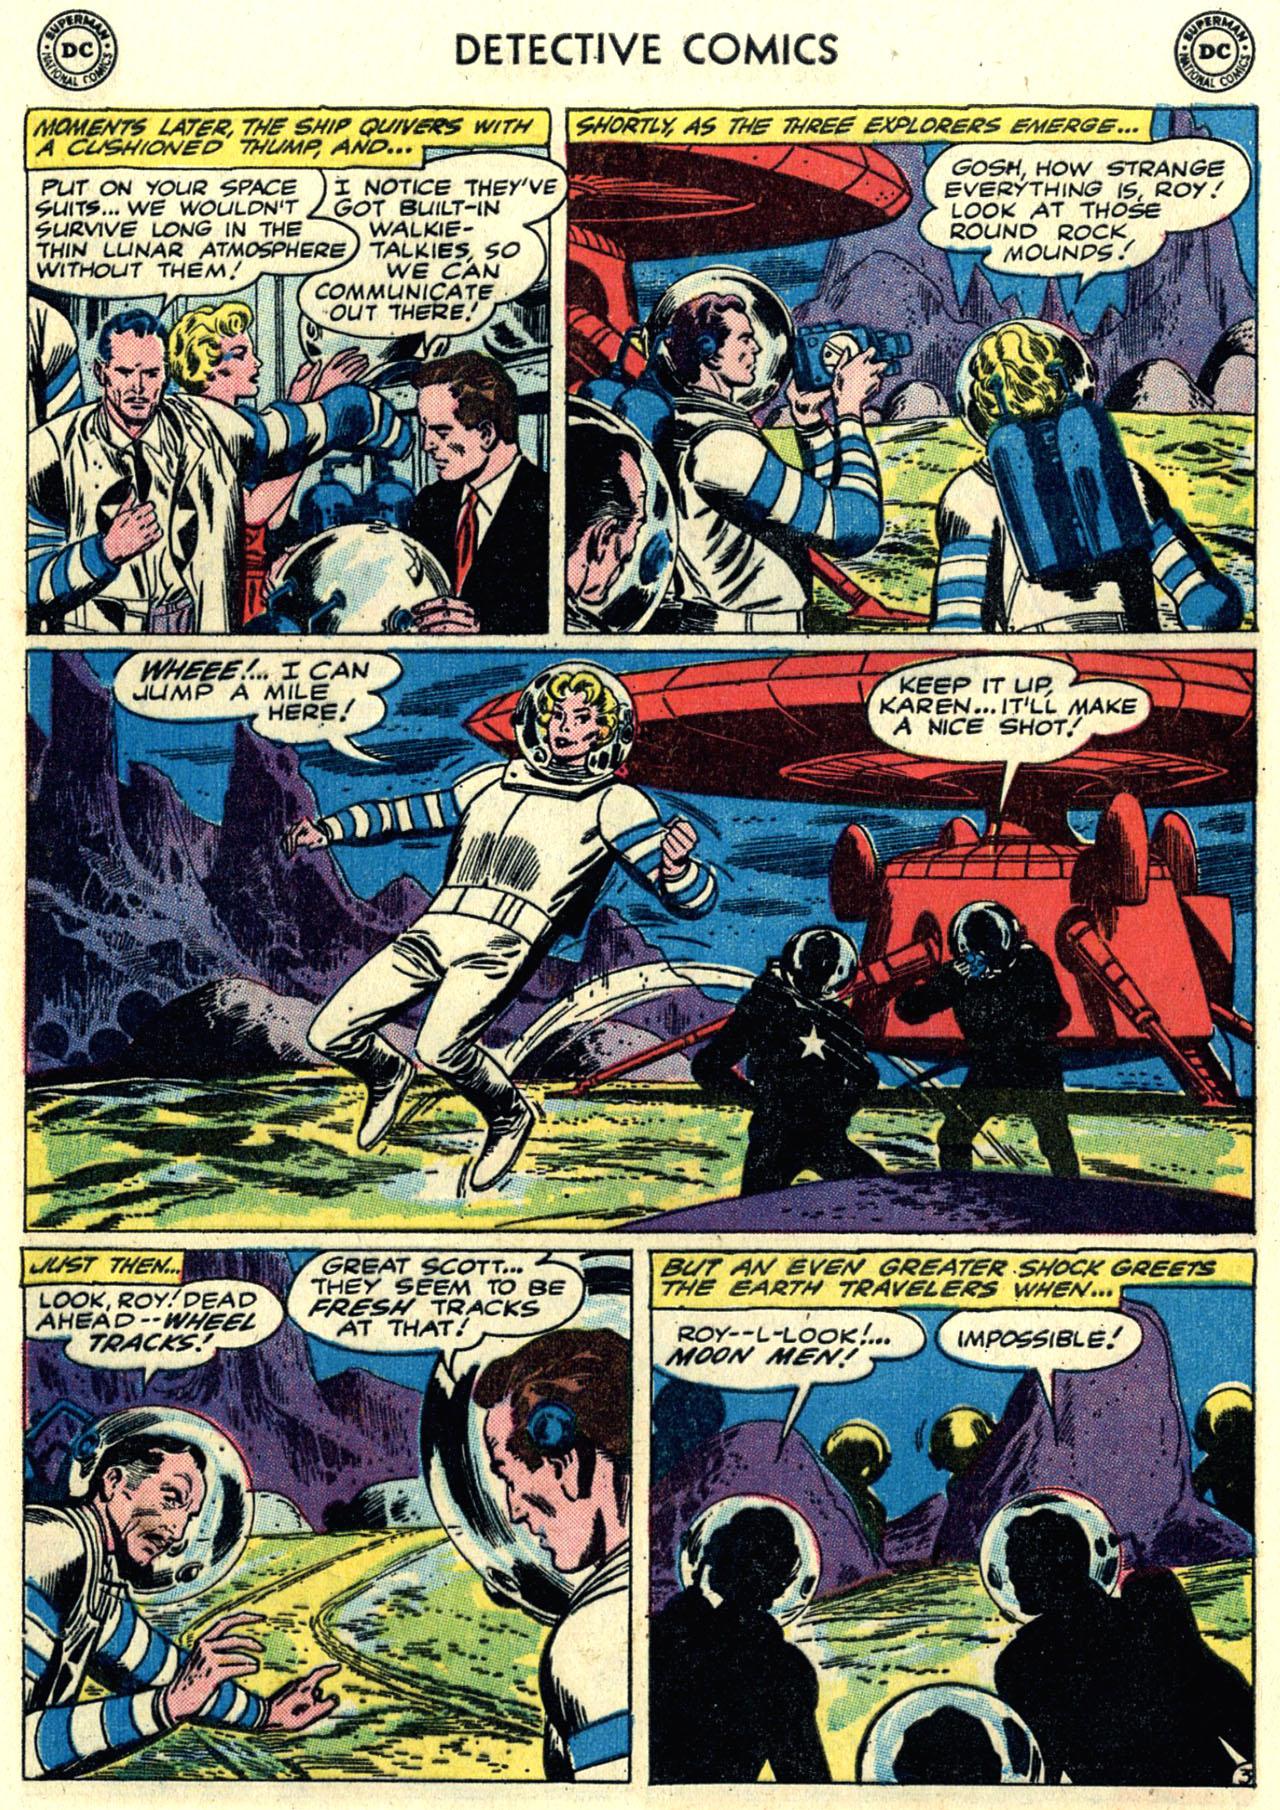 Detective Comics (1937) 283 Page 19